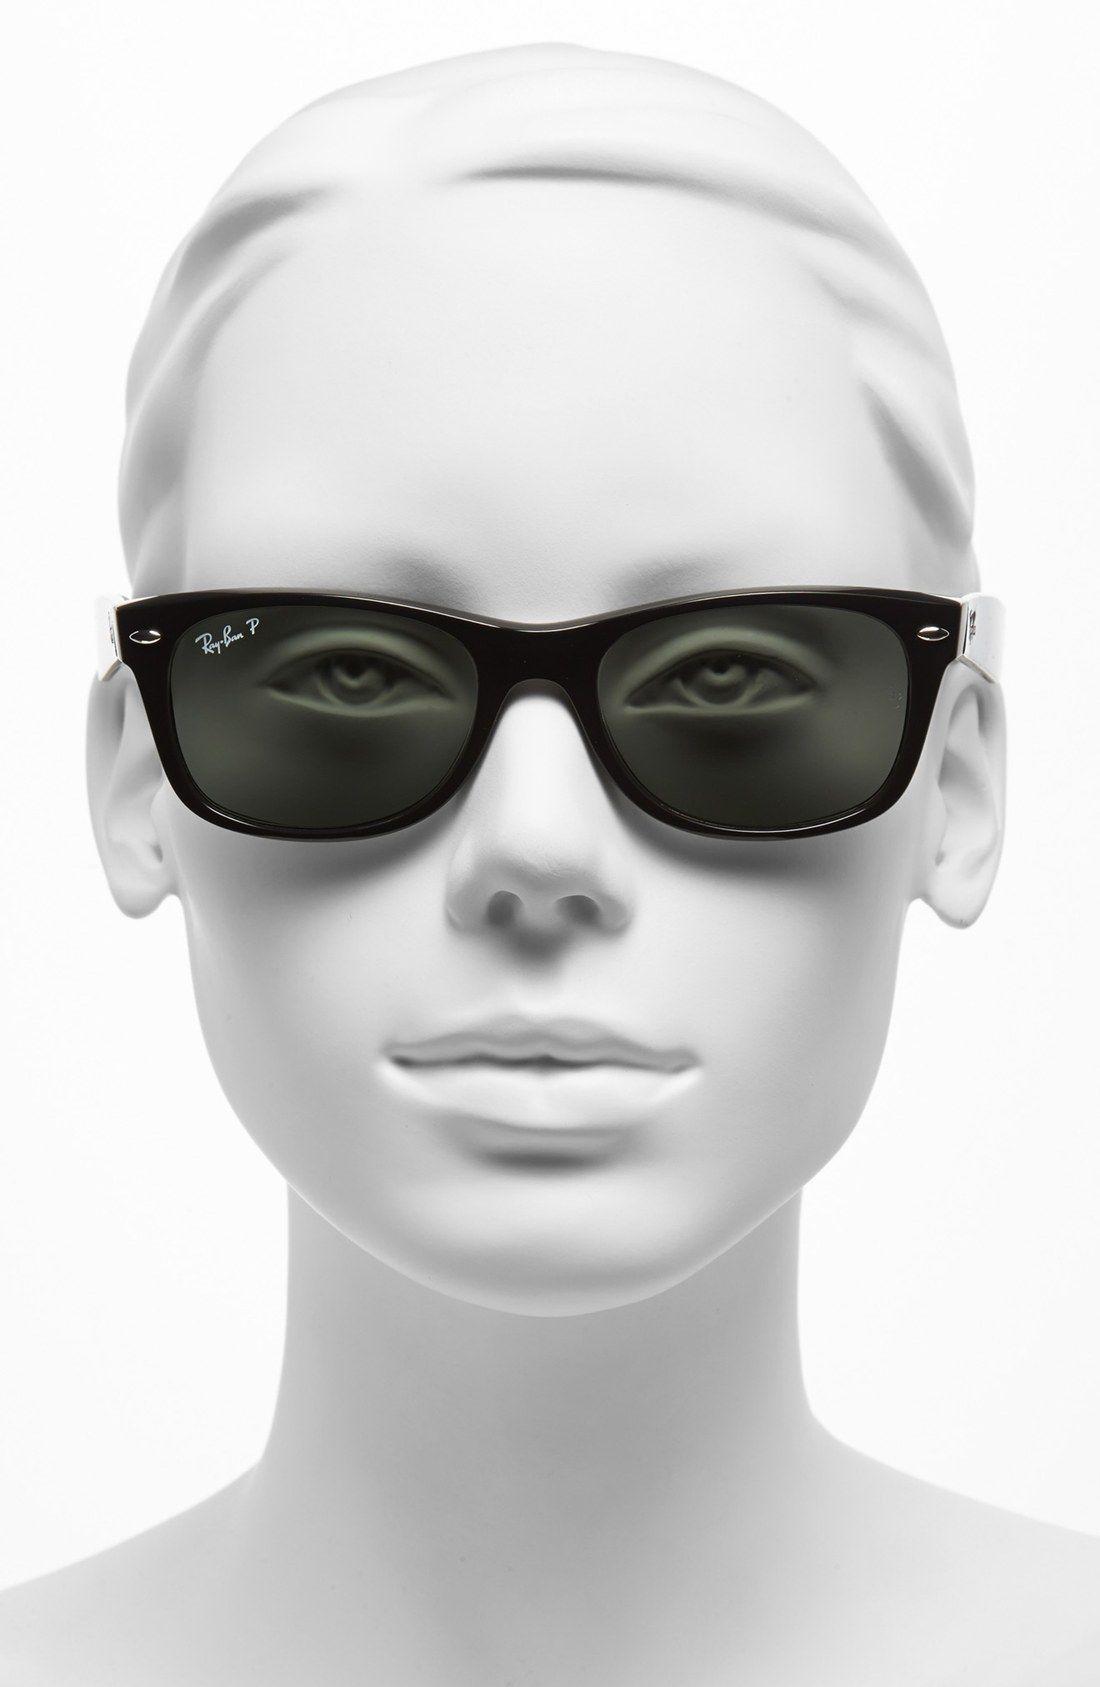 Ray Ban Small New Wayfarer 52mm Polarized Sunglasses Nordstrom Ray Ban Sunglasses Wayfarer Flat Top Sunglasses Classic Aviator Sunglasses